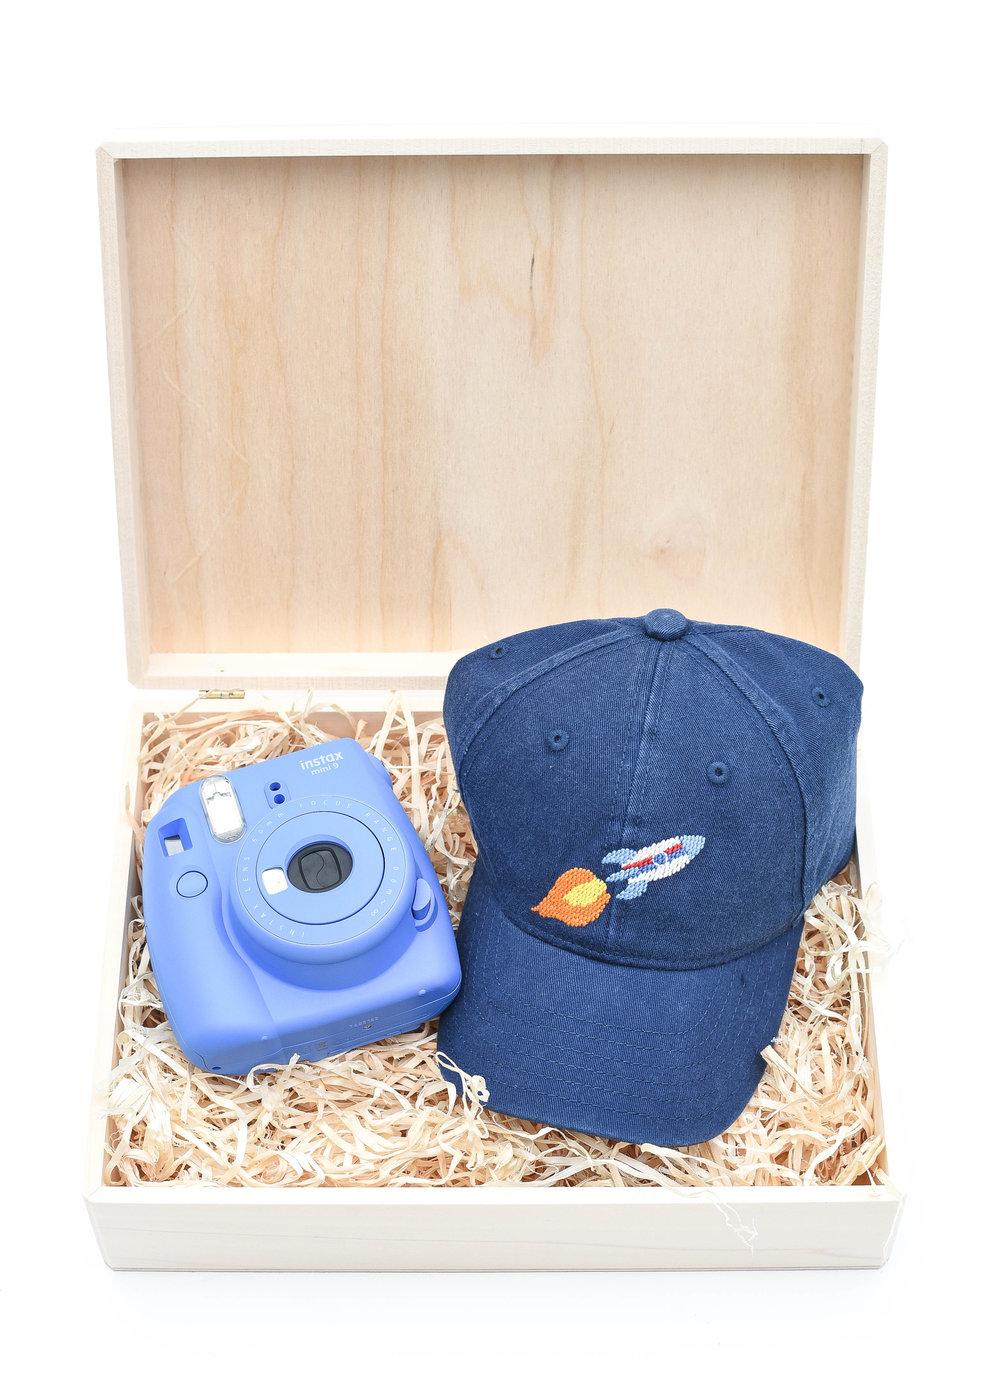 For Kids | Camera Set - L:R |Instax Mini 9 Instant Camera|Kid's Needlepoint Hat